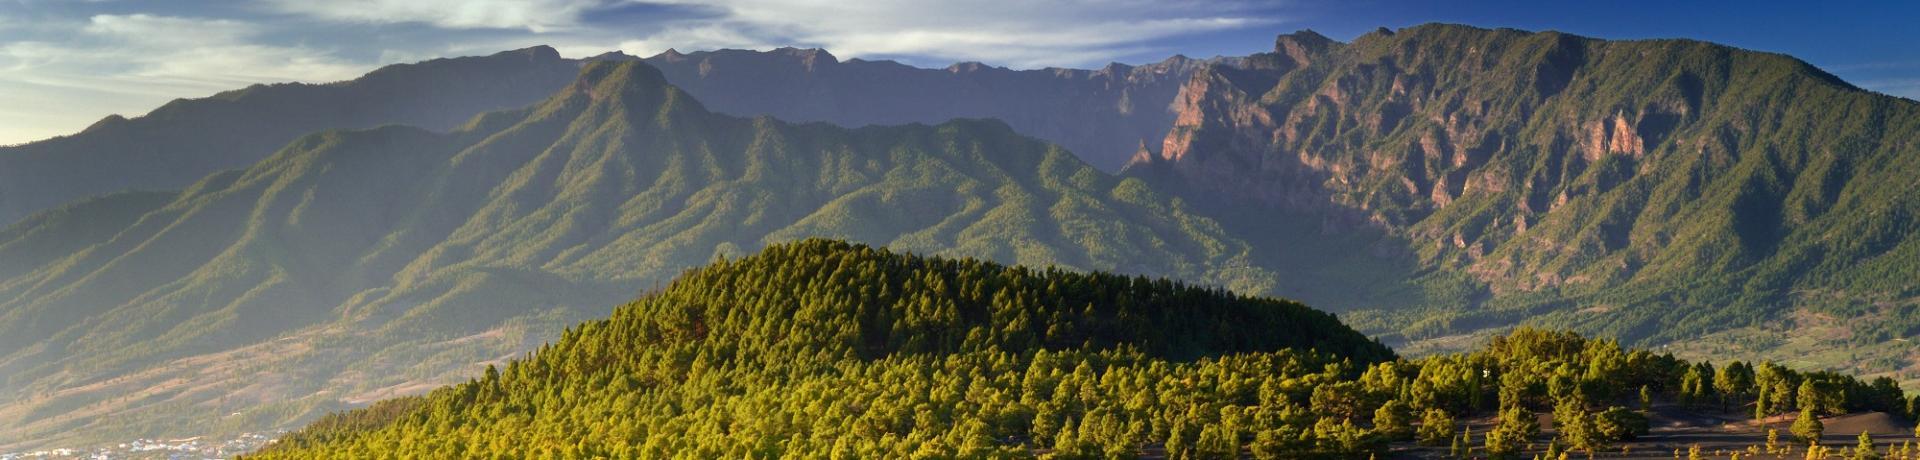 La Palma Berge Natur Emotion